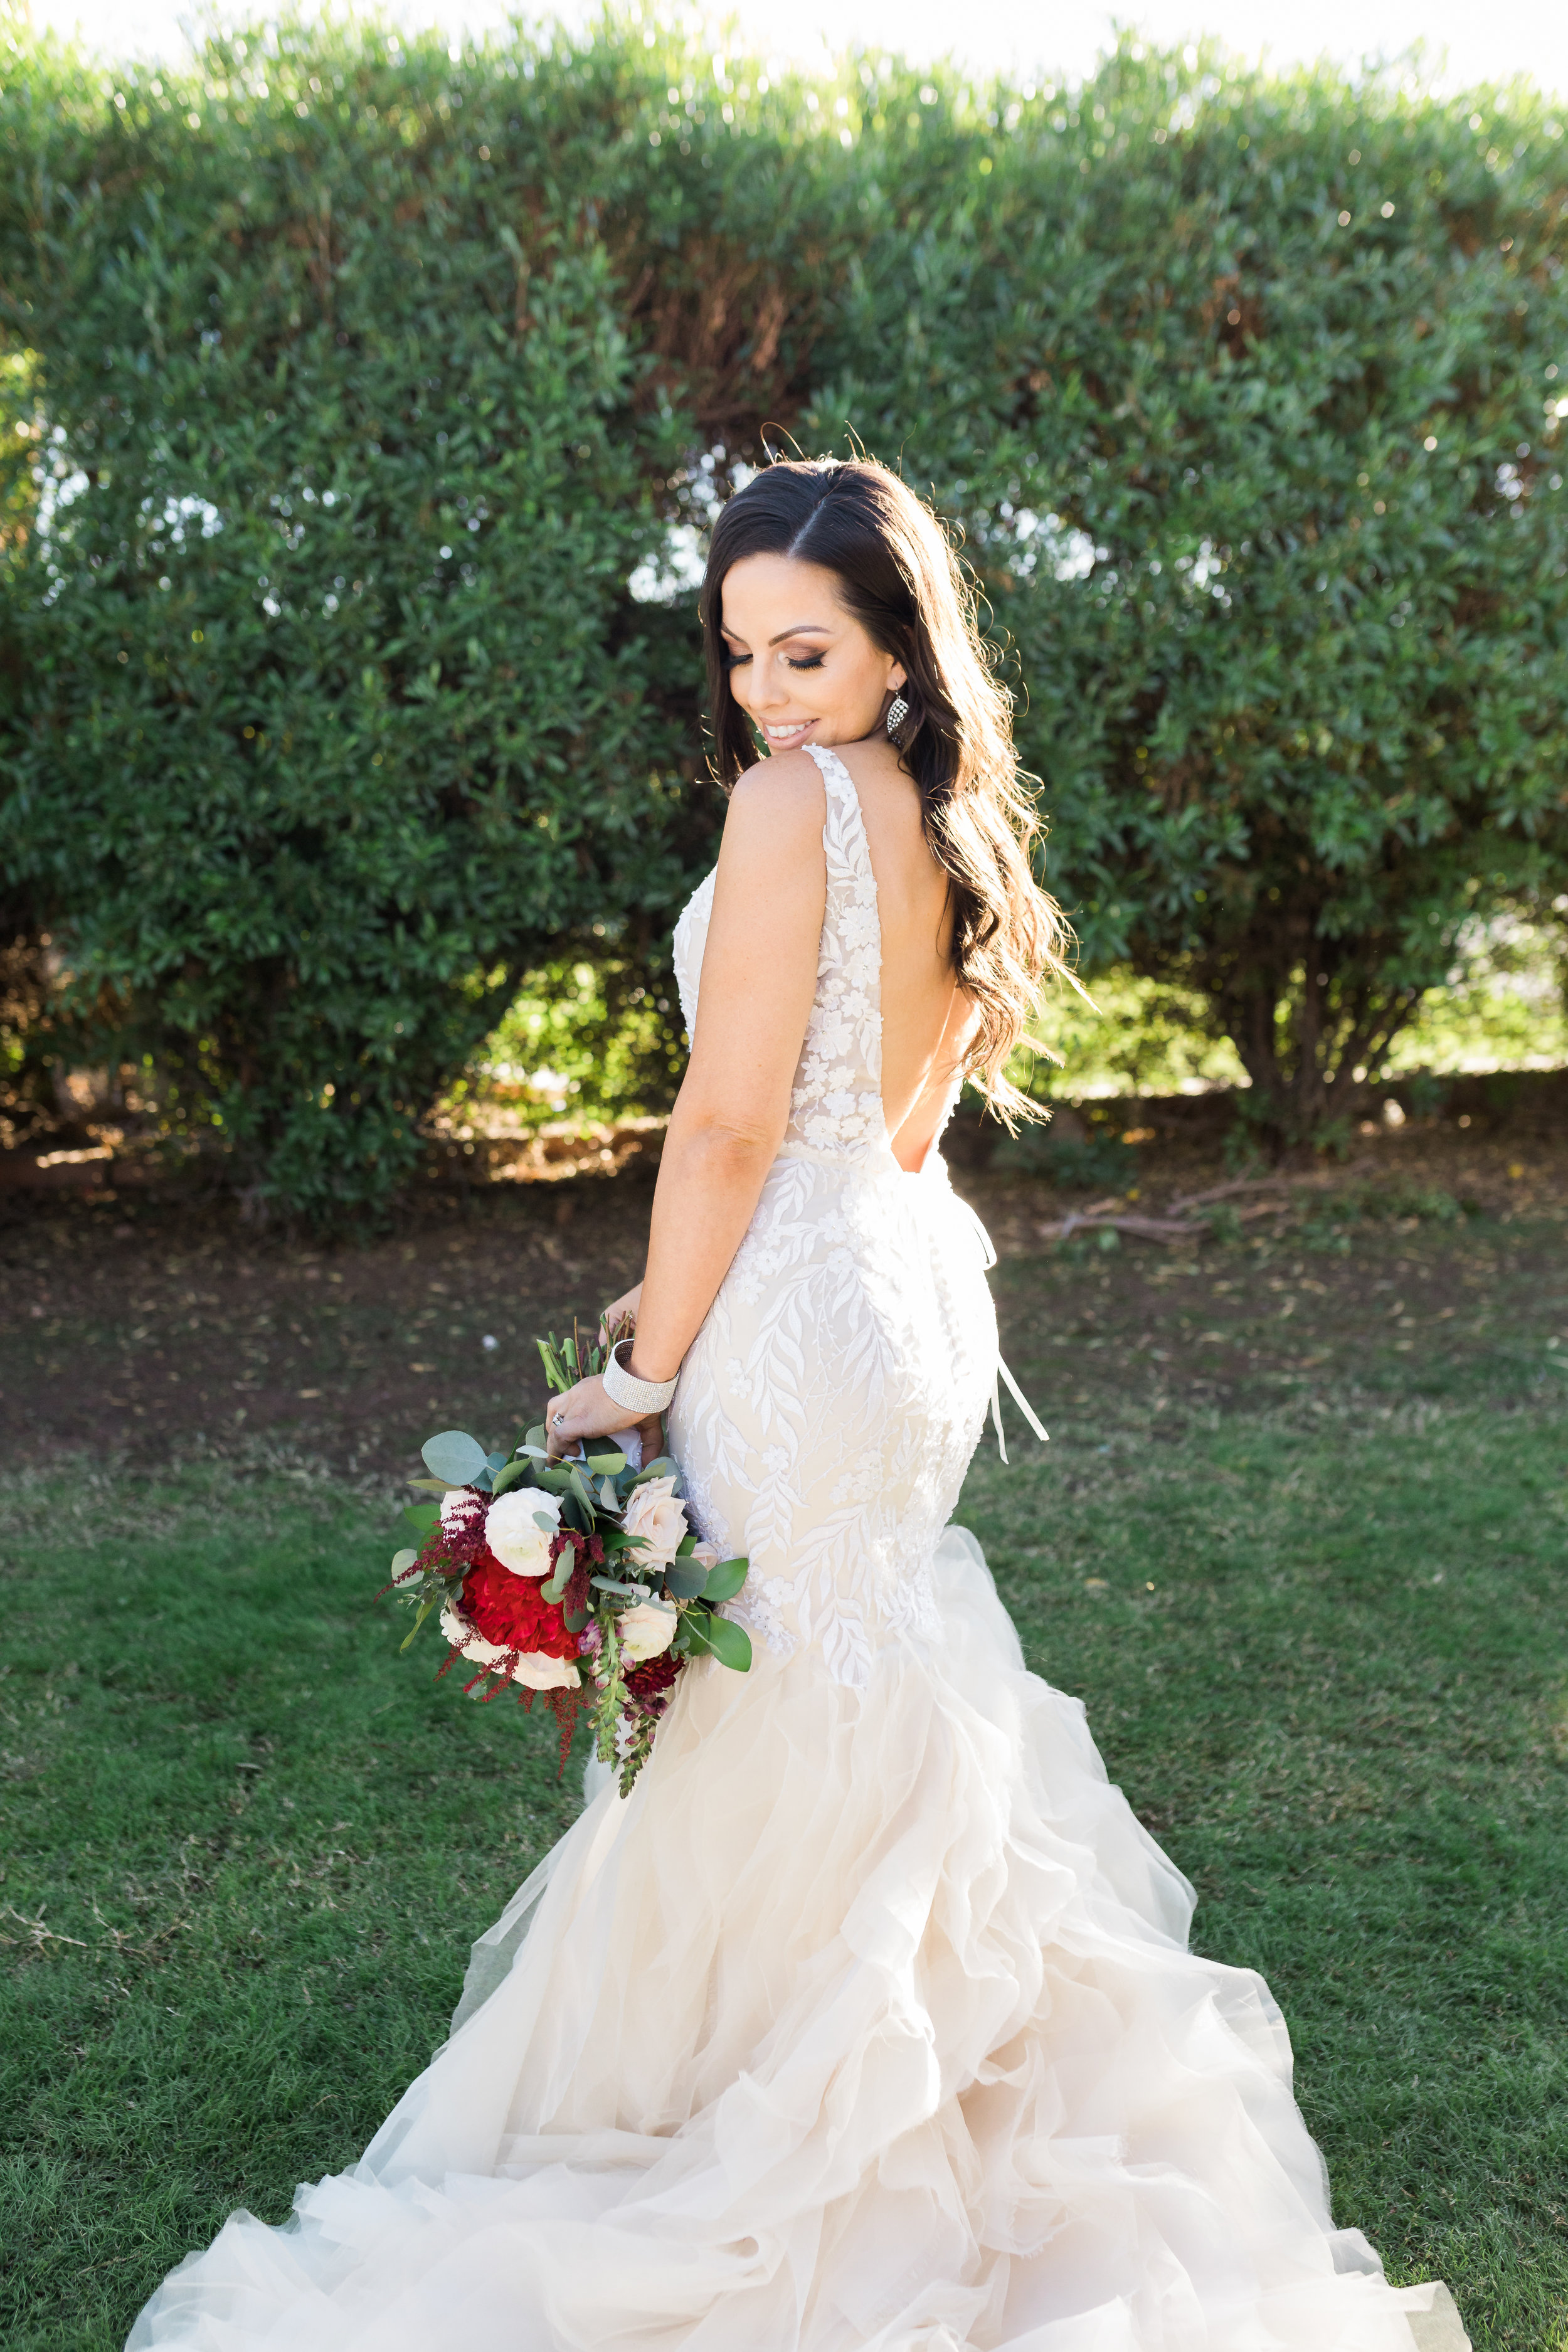 Gather-Estate-Wedding-Mesa-Arizona-Tara-Nichole-Photo-9.jpg